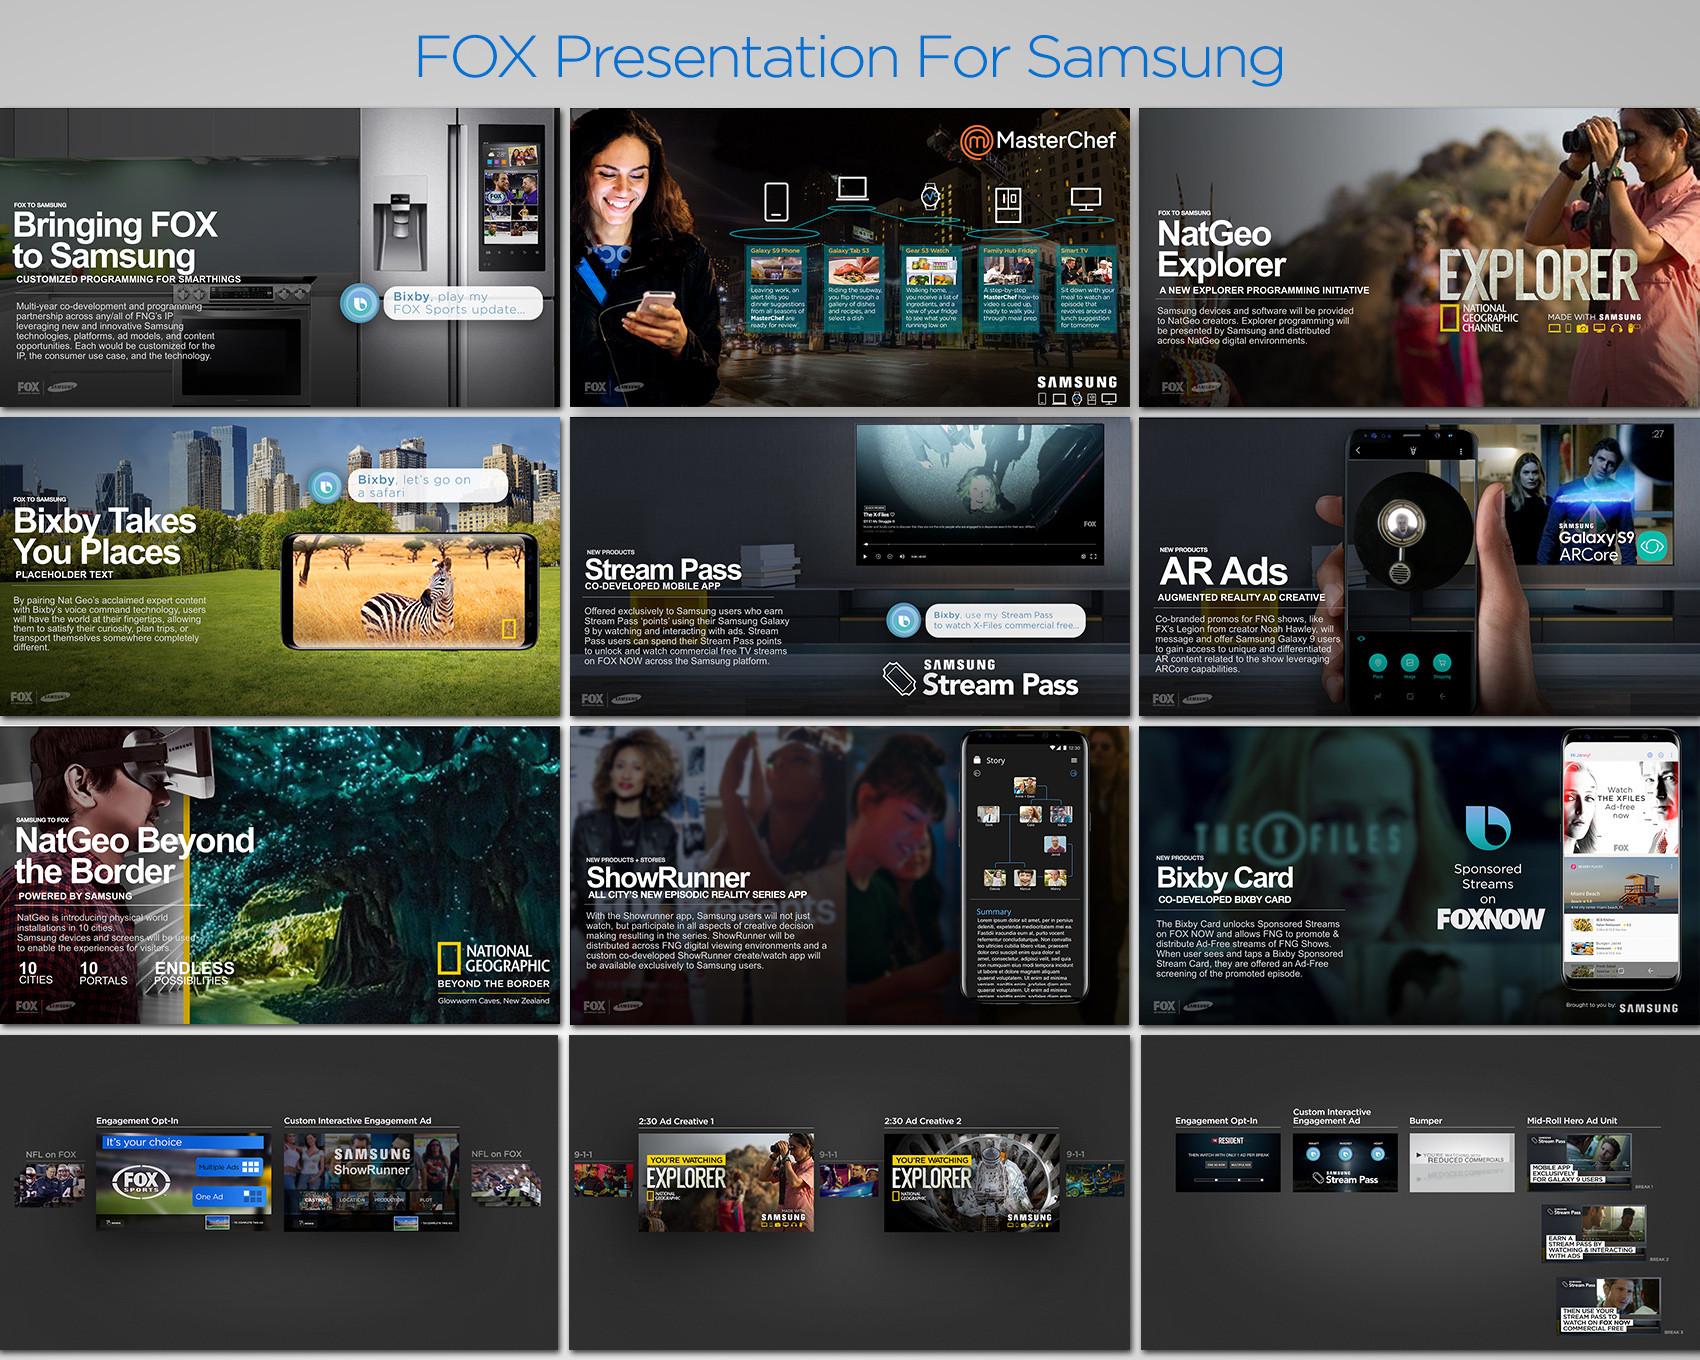 FOX Presentation For Samsung